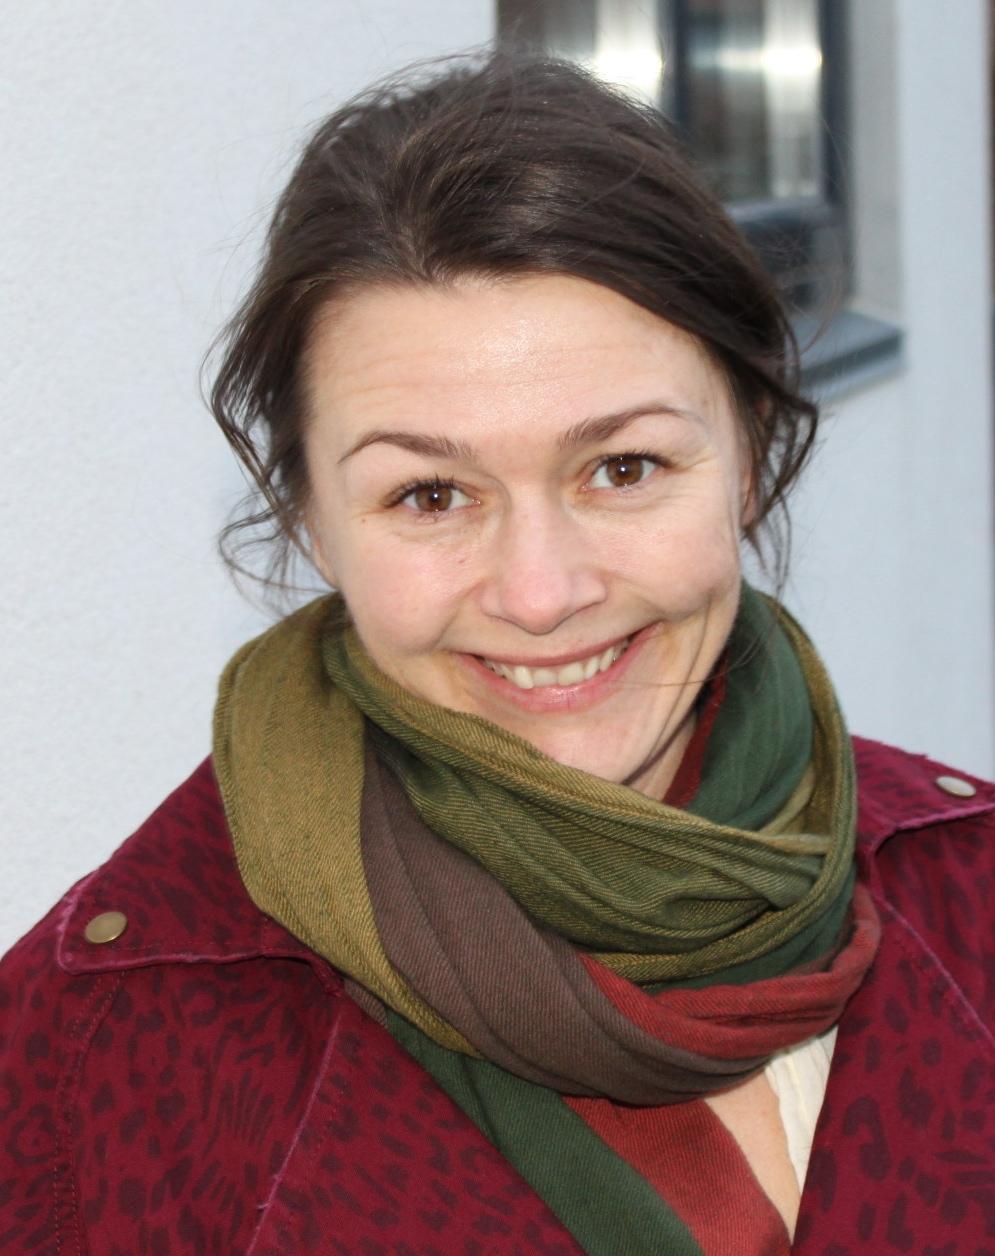 Anne Rahbek Zizzo